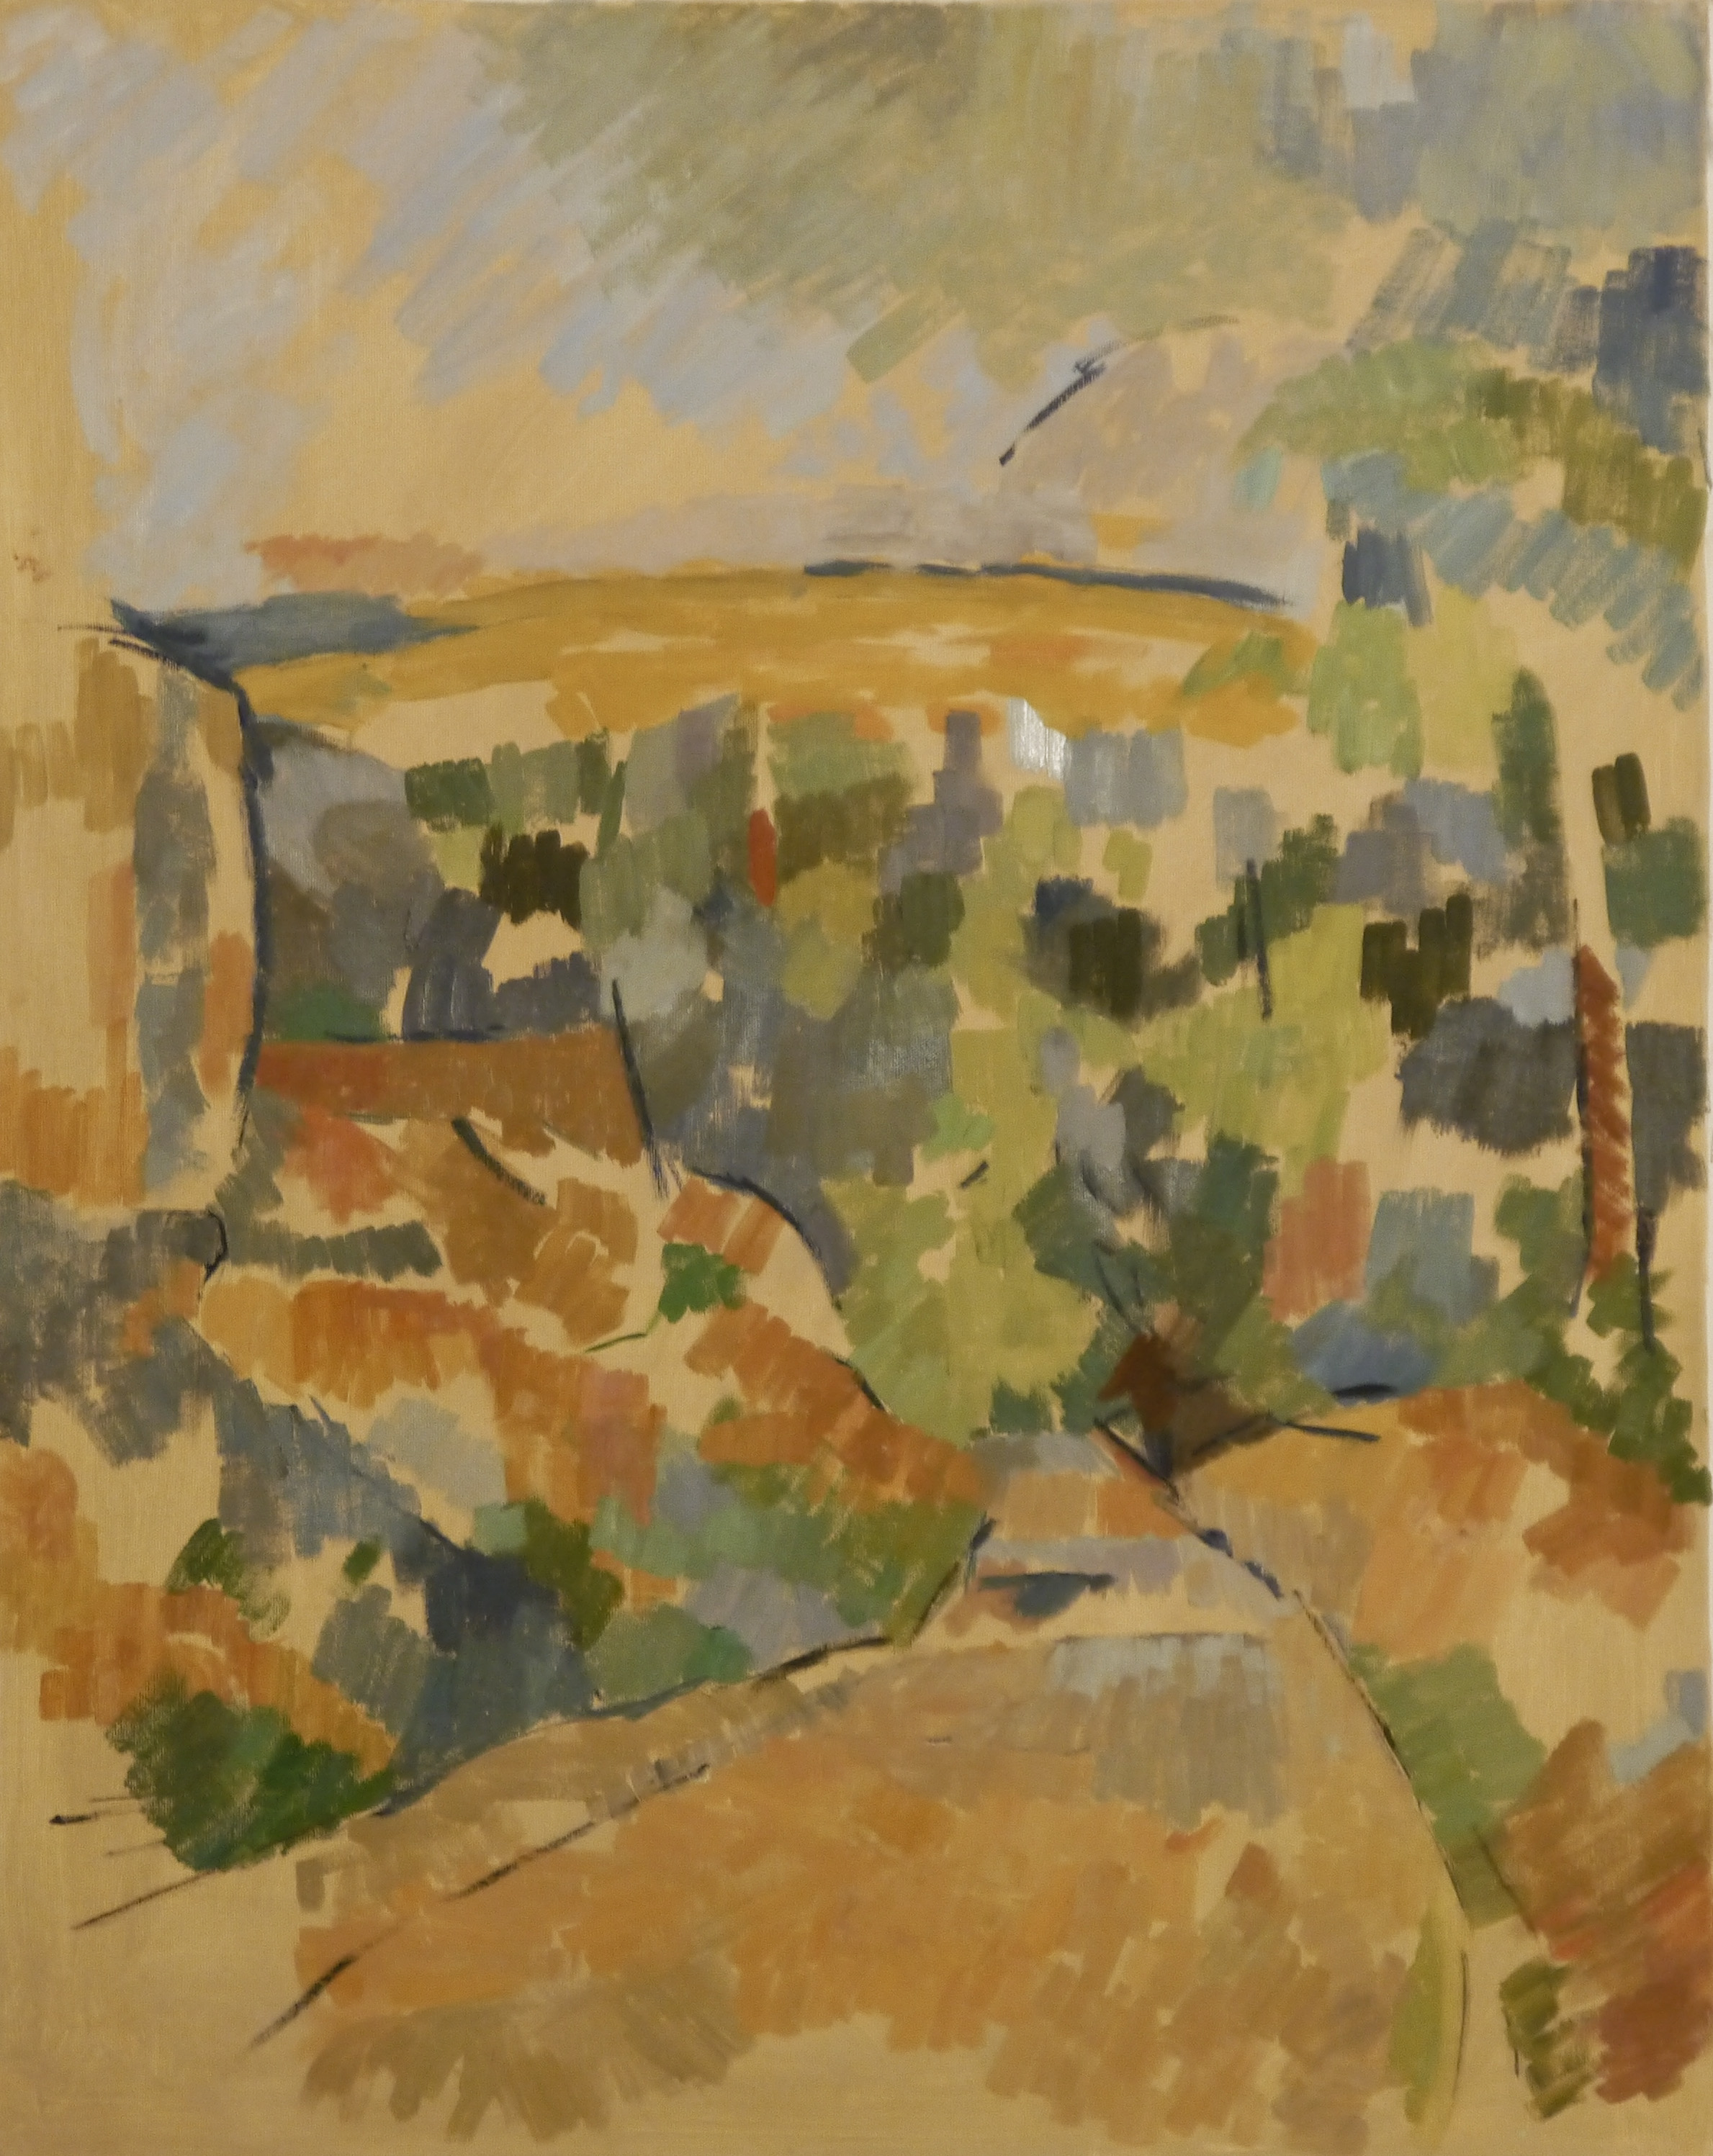 Cezanne copy by Robert O'Brien